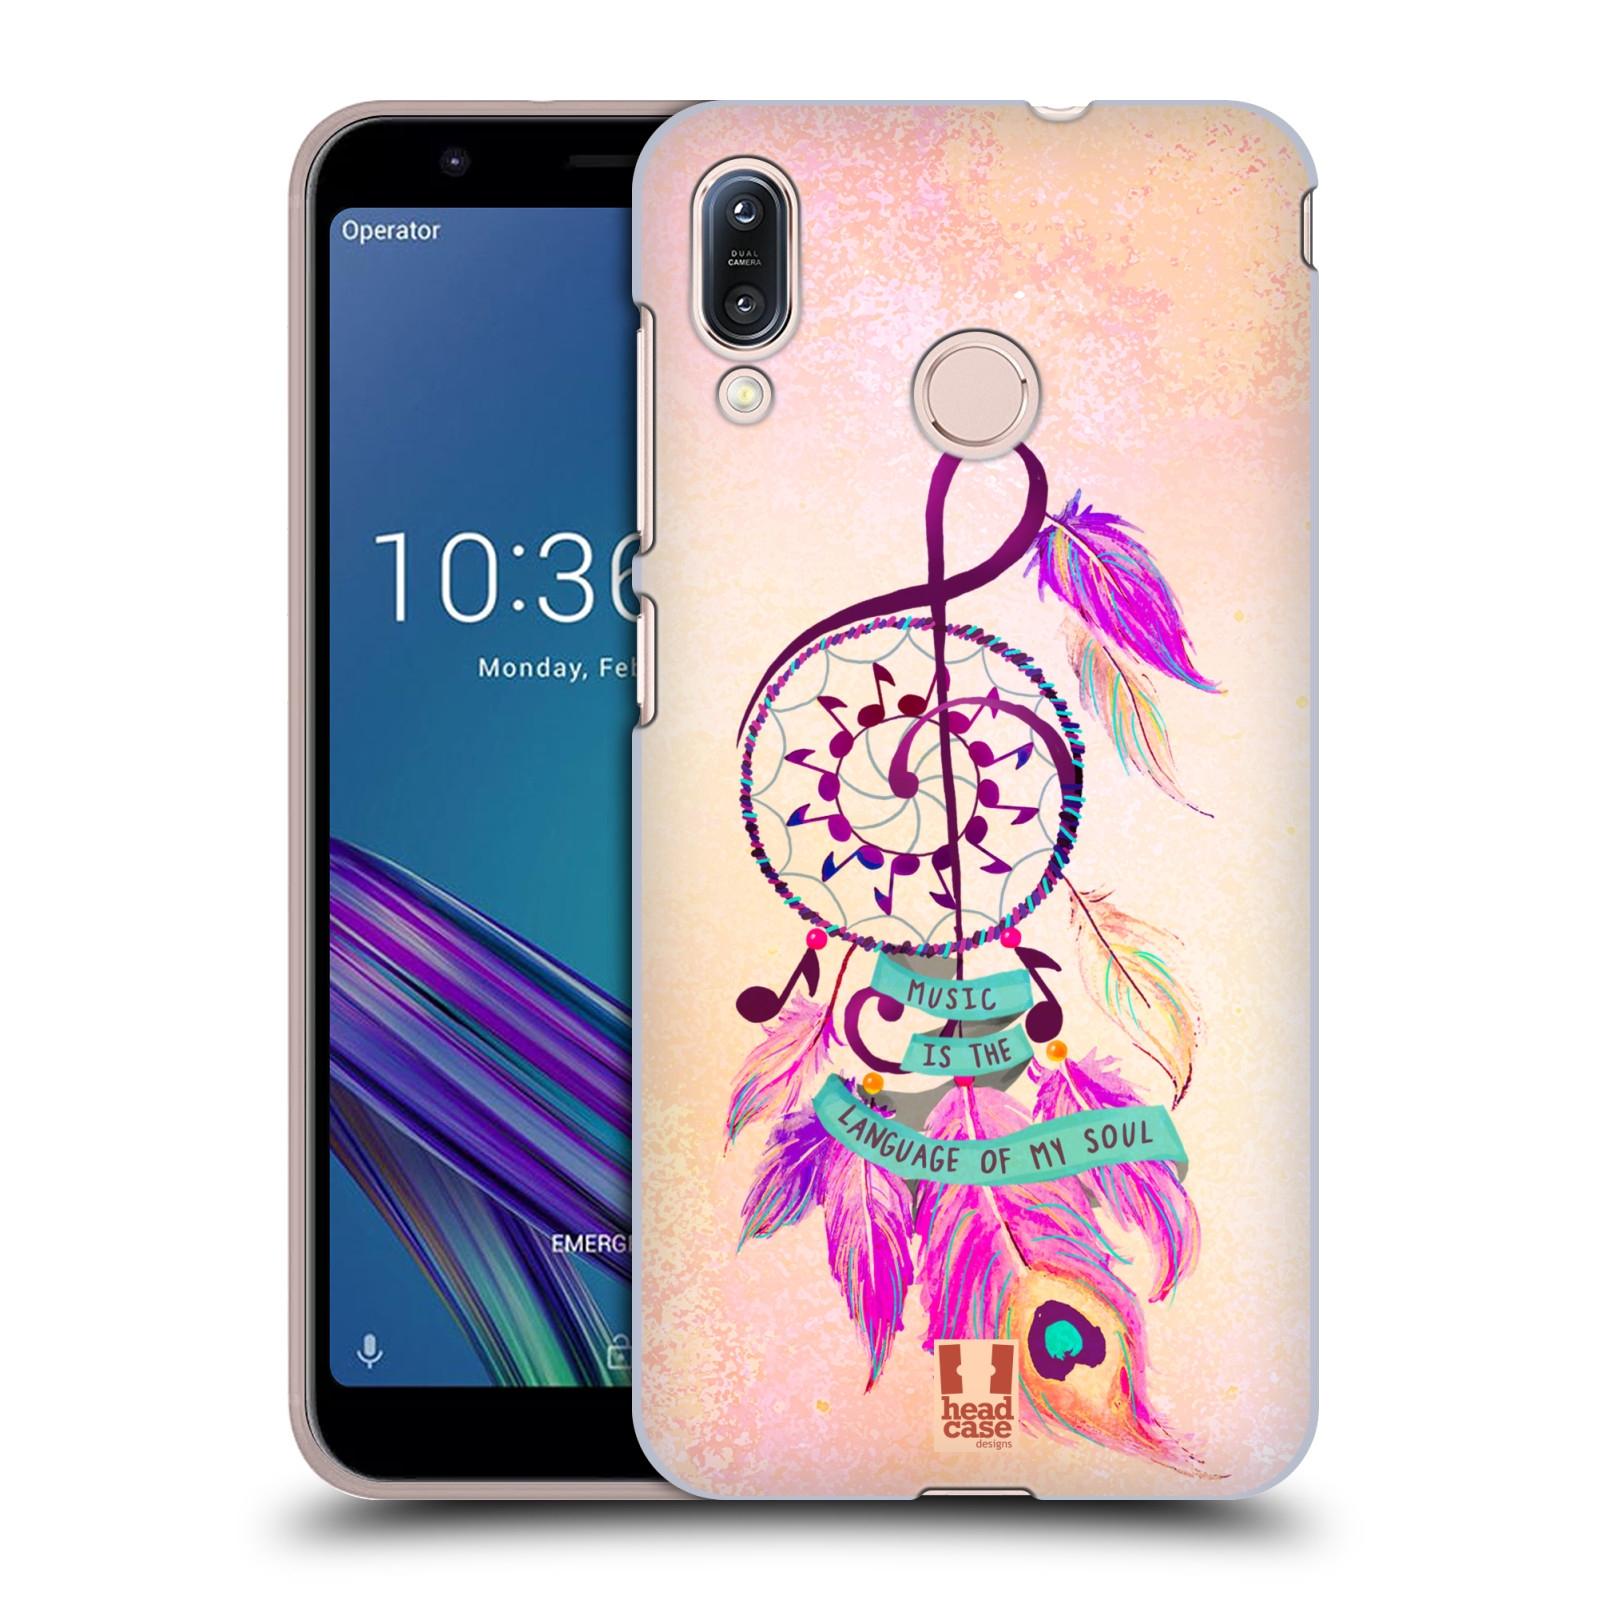 Plastové pouzdro na mobil Asus Zenfone Max M1 ZB555KL - Head Case - Lapač Assorted Music